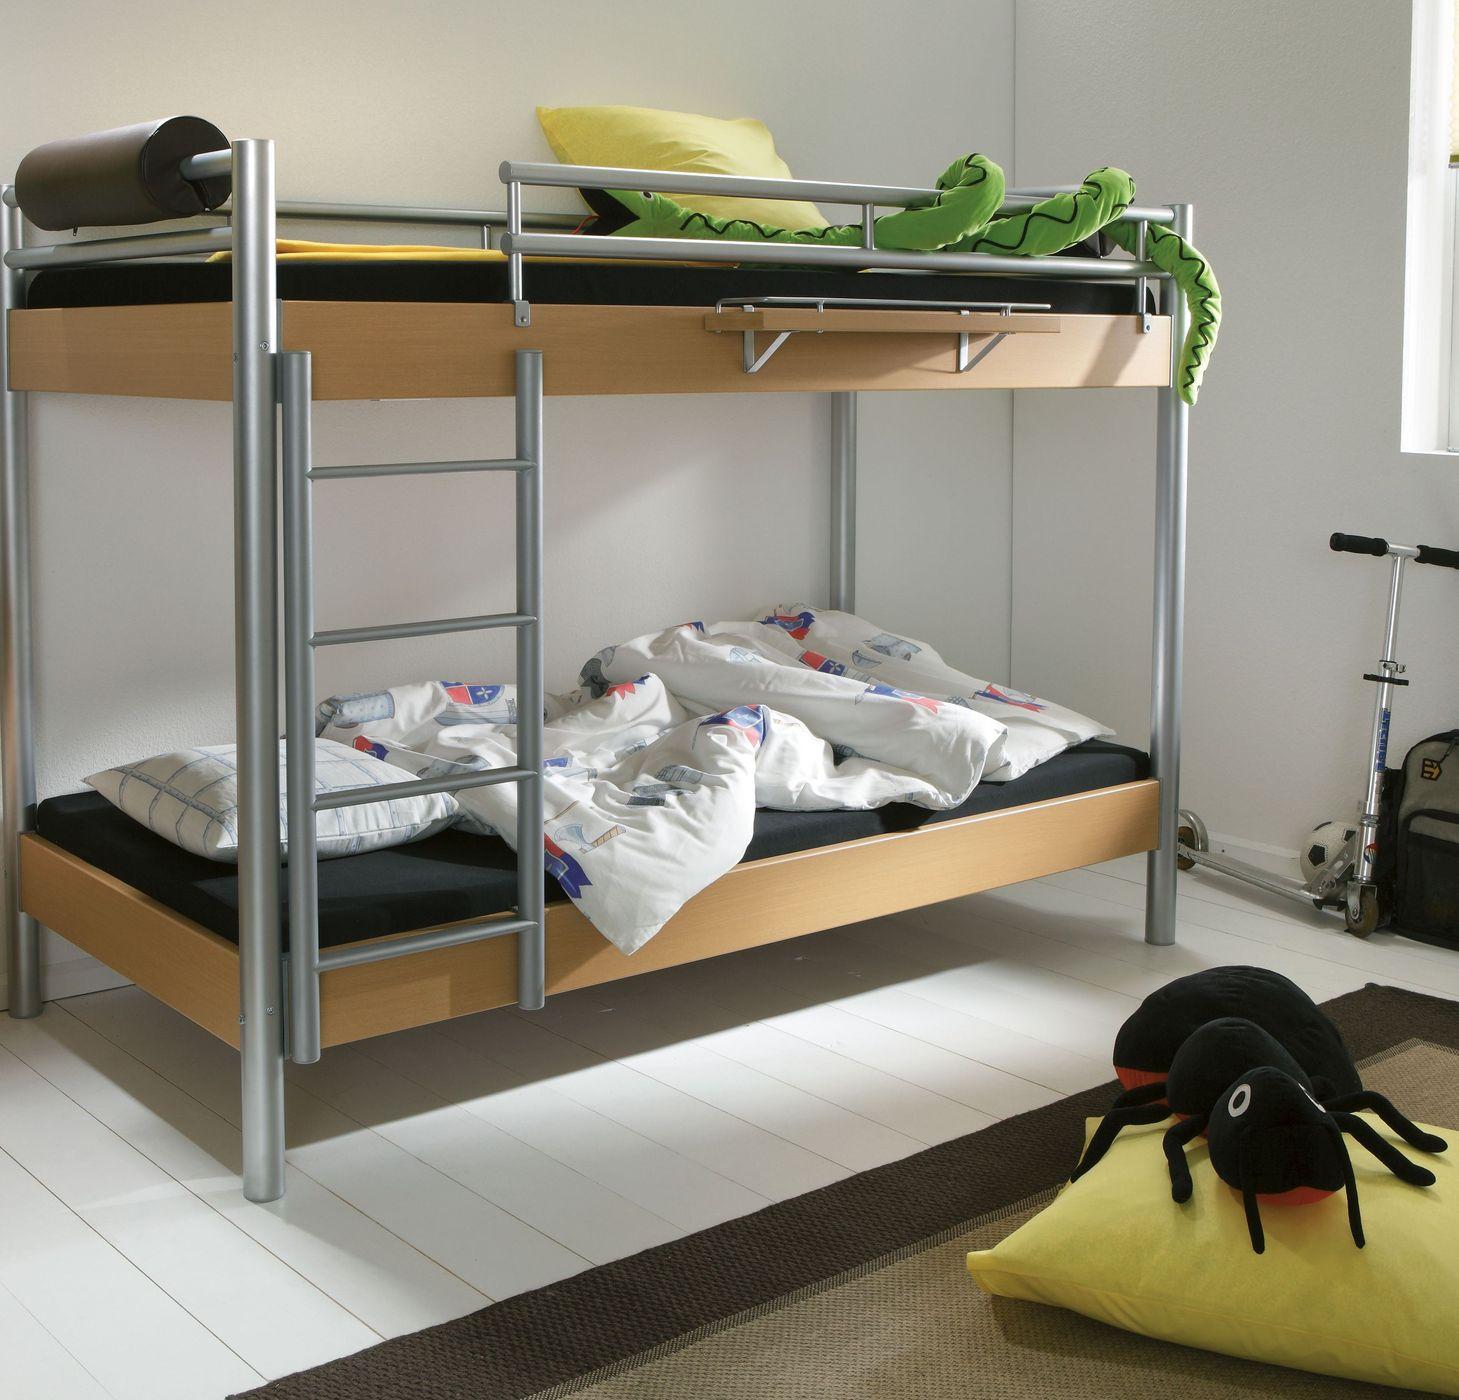 robustes midi etagenbett mit leiter und t v gepr ft jona. Black Bedroom Furniture Sets. Home Design Ideas